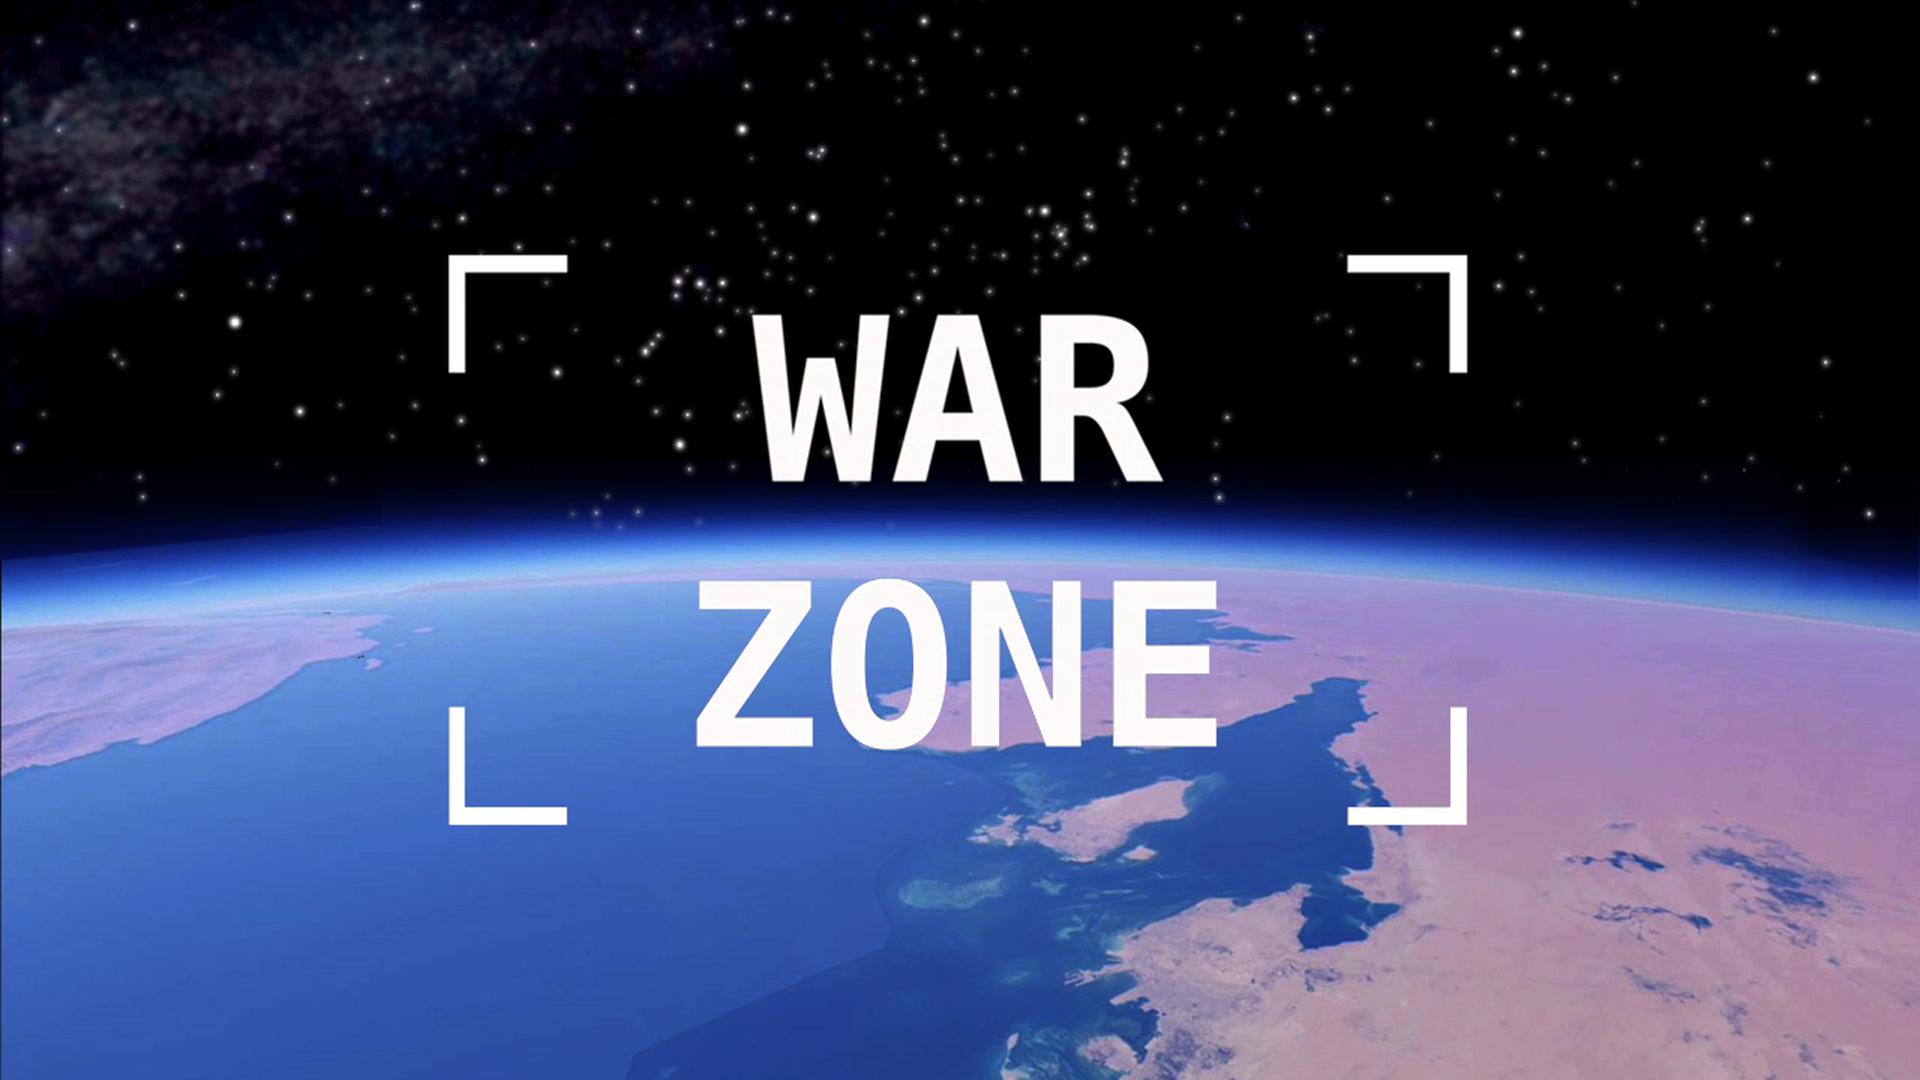 ©2014, Nicolas Maigret, War Zone